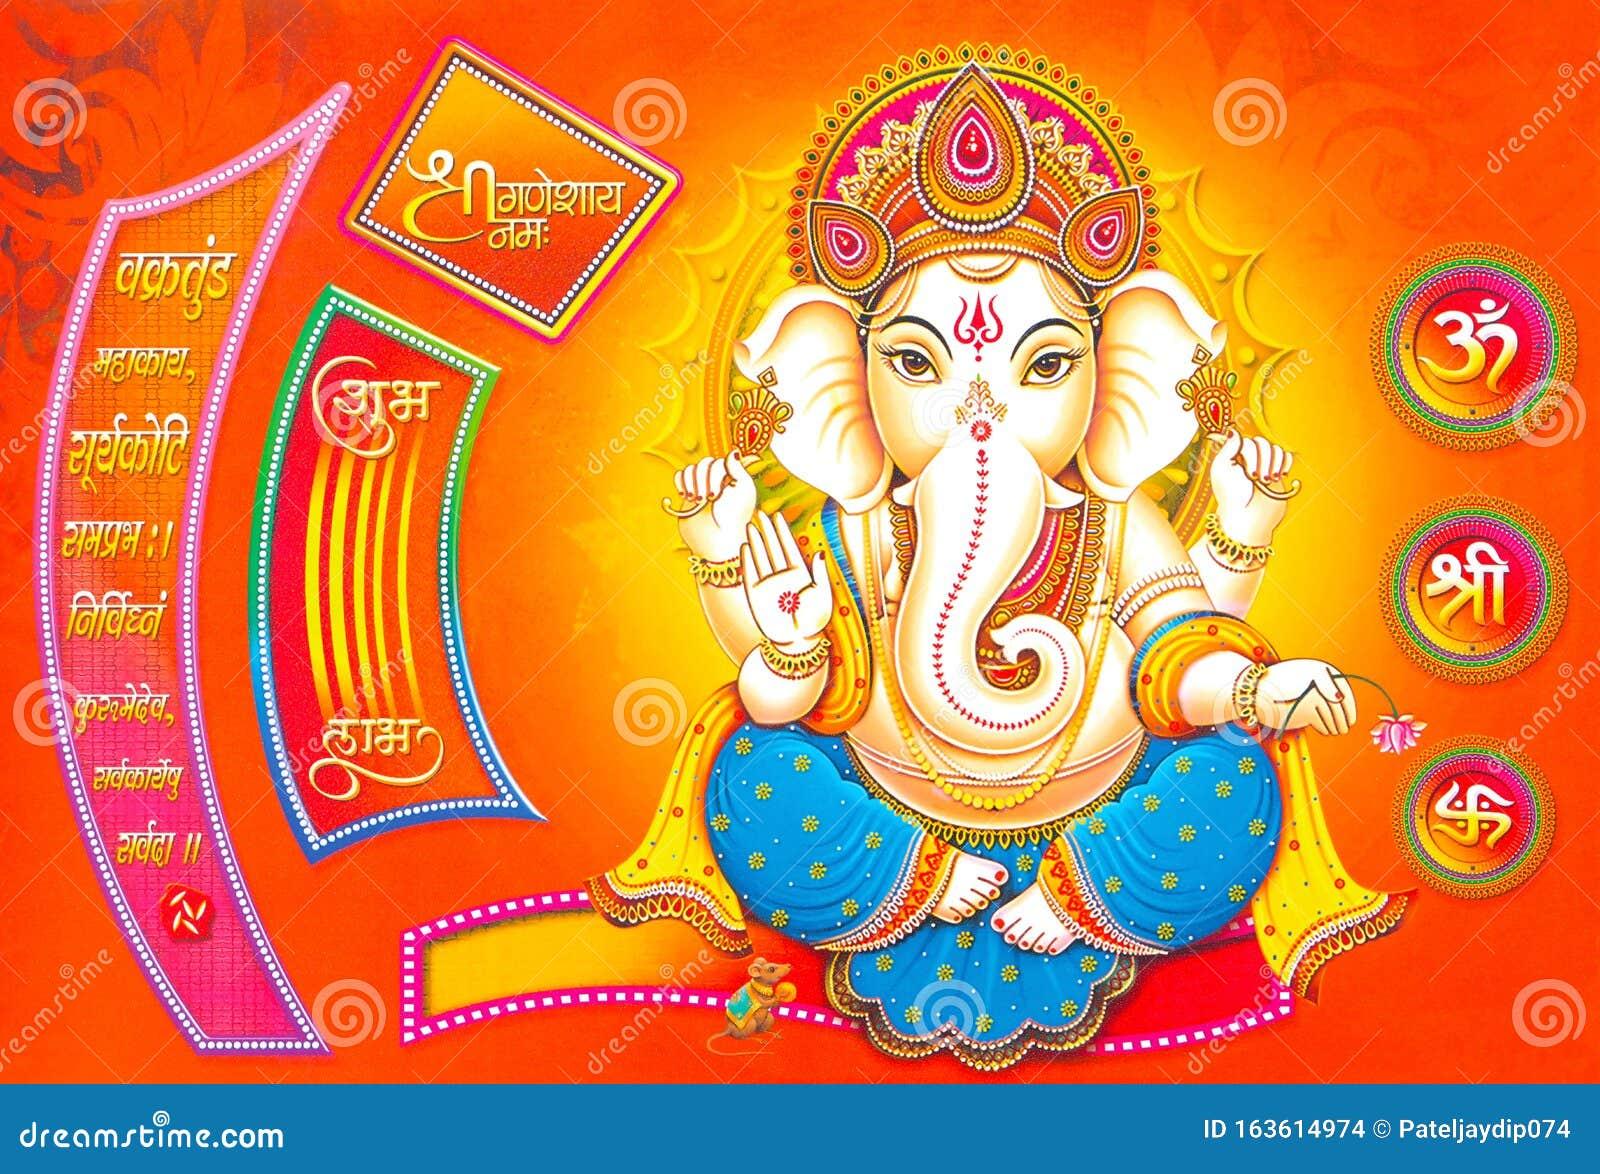 indian god ganesh wallpaper high definition lord ganesha indian god son mahadev india lord ganesha ganpati 163614974